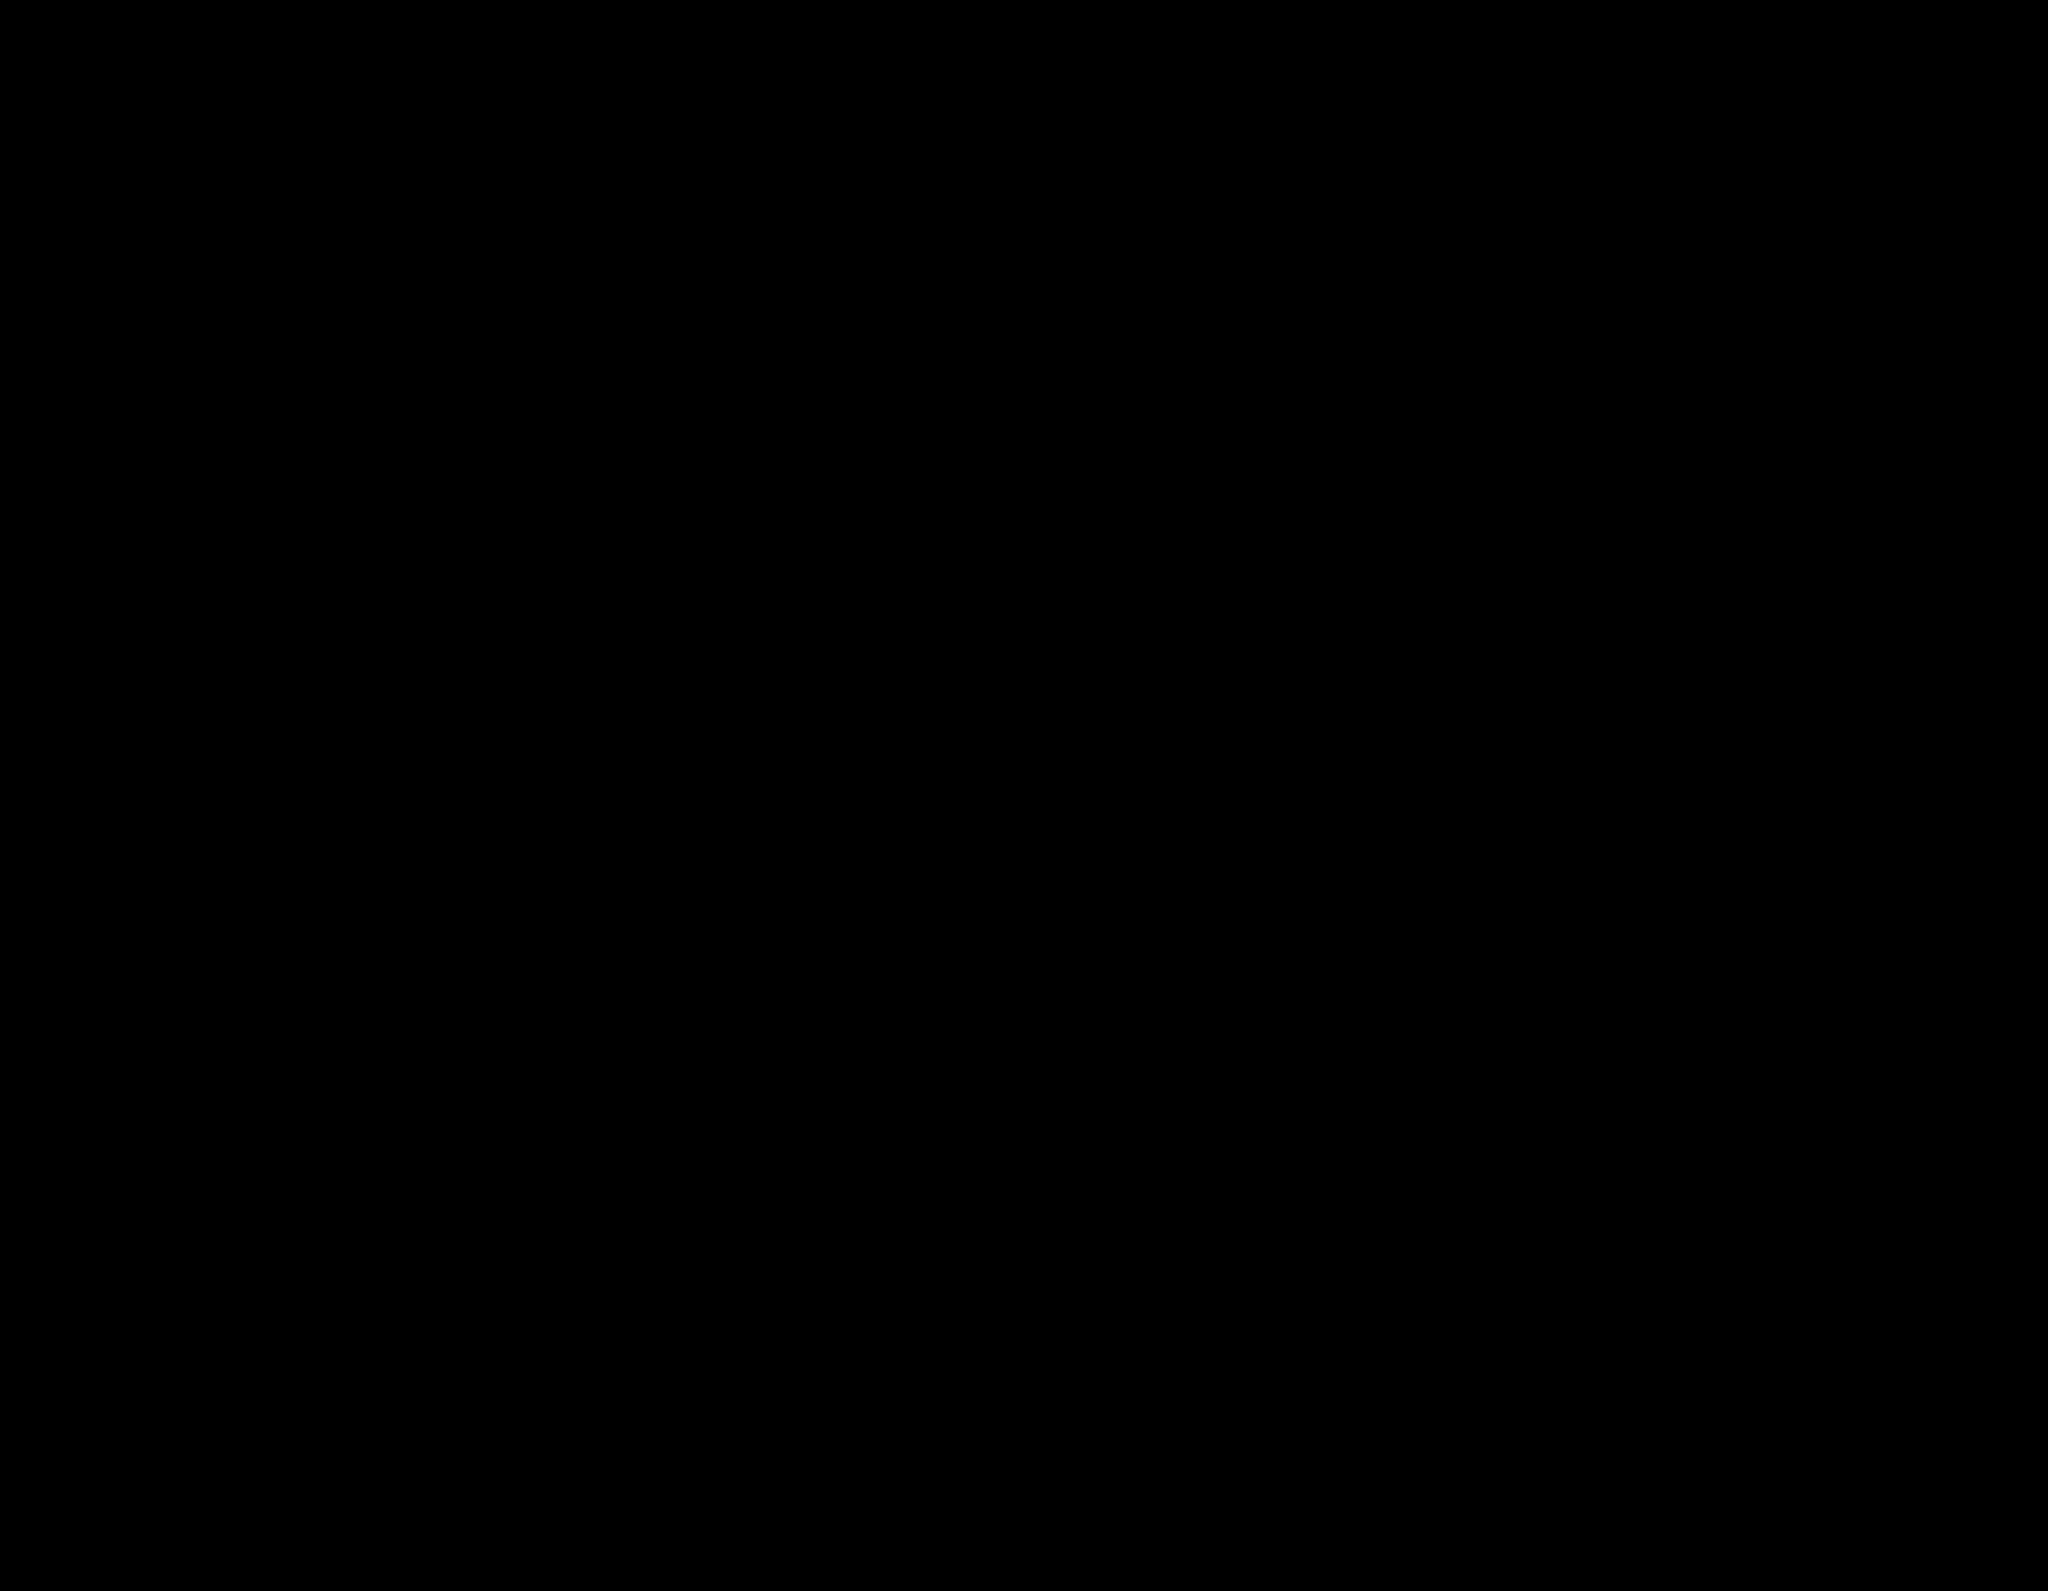 cantons logo